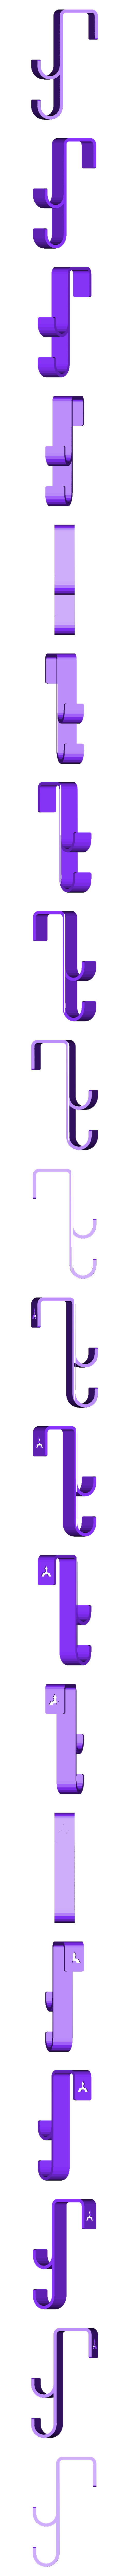 Cubicle_Hook.stl Download free STL file Cubicle Hook • 3D printable design, DraftingJake